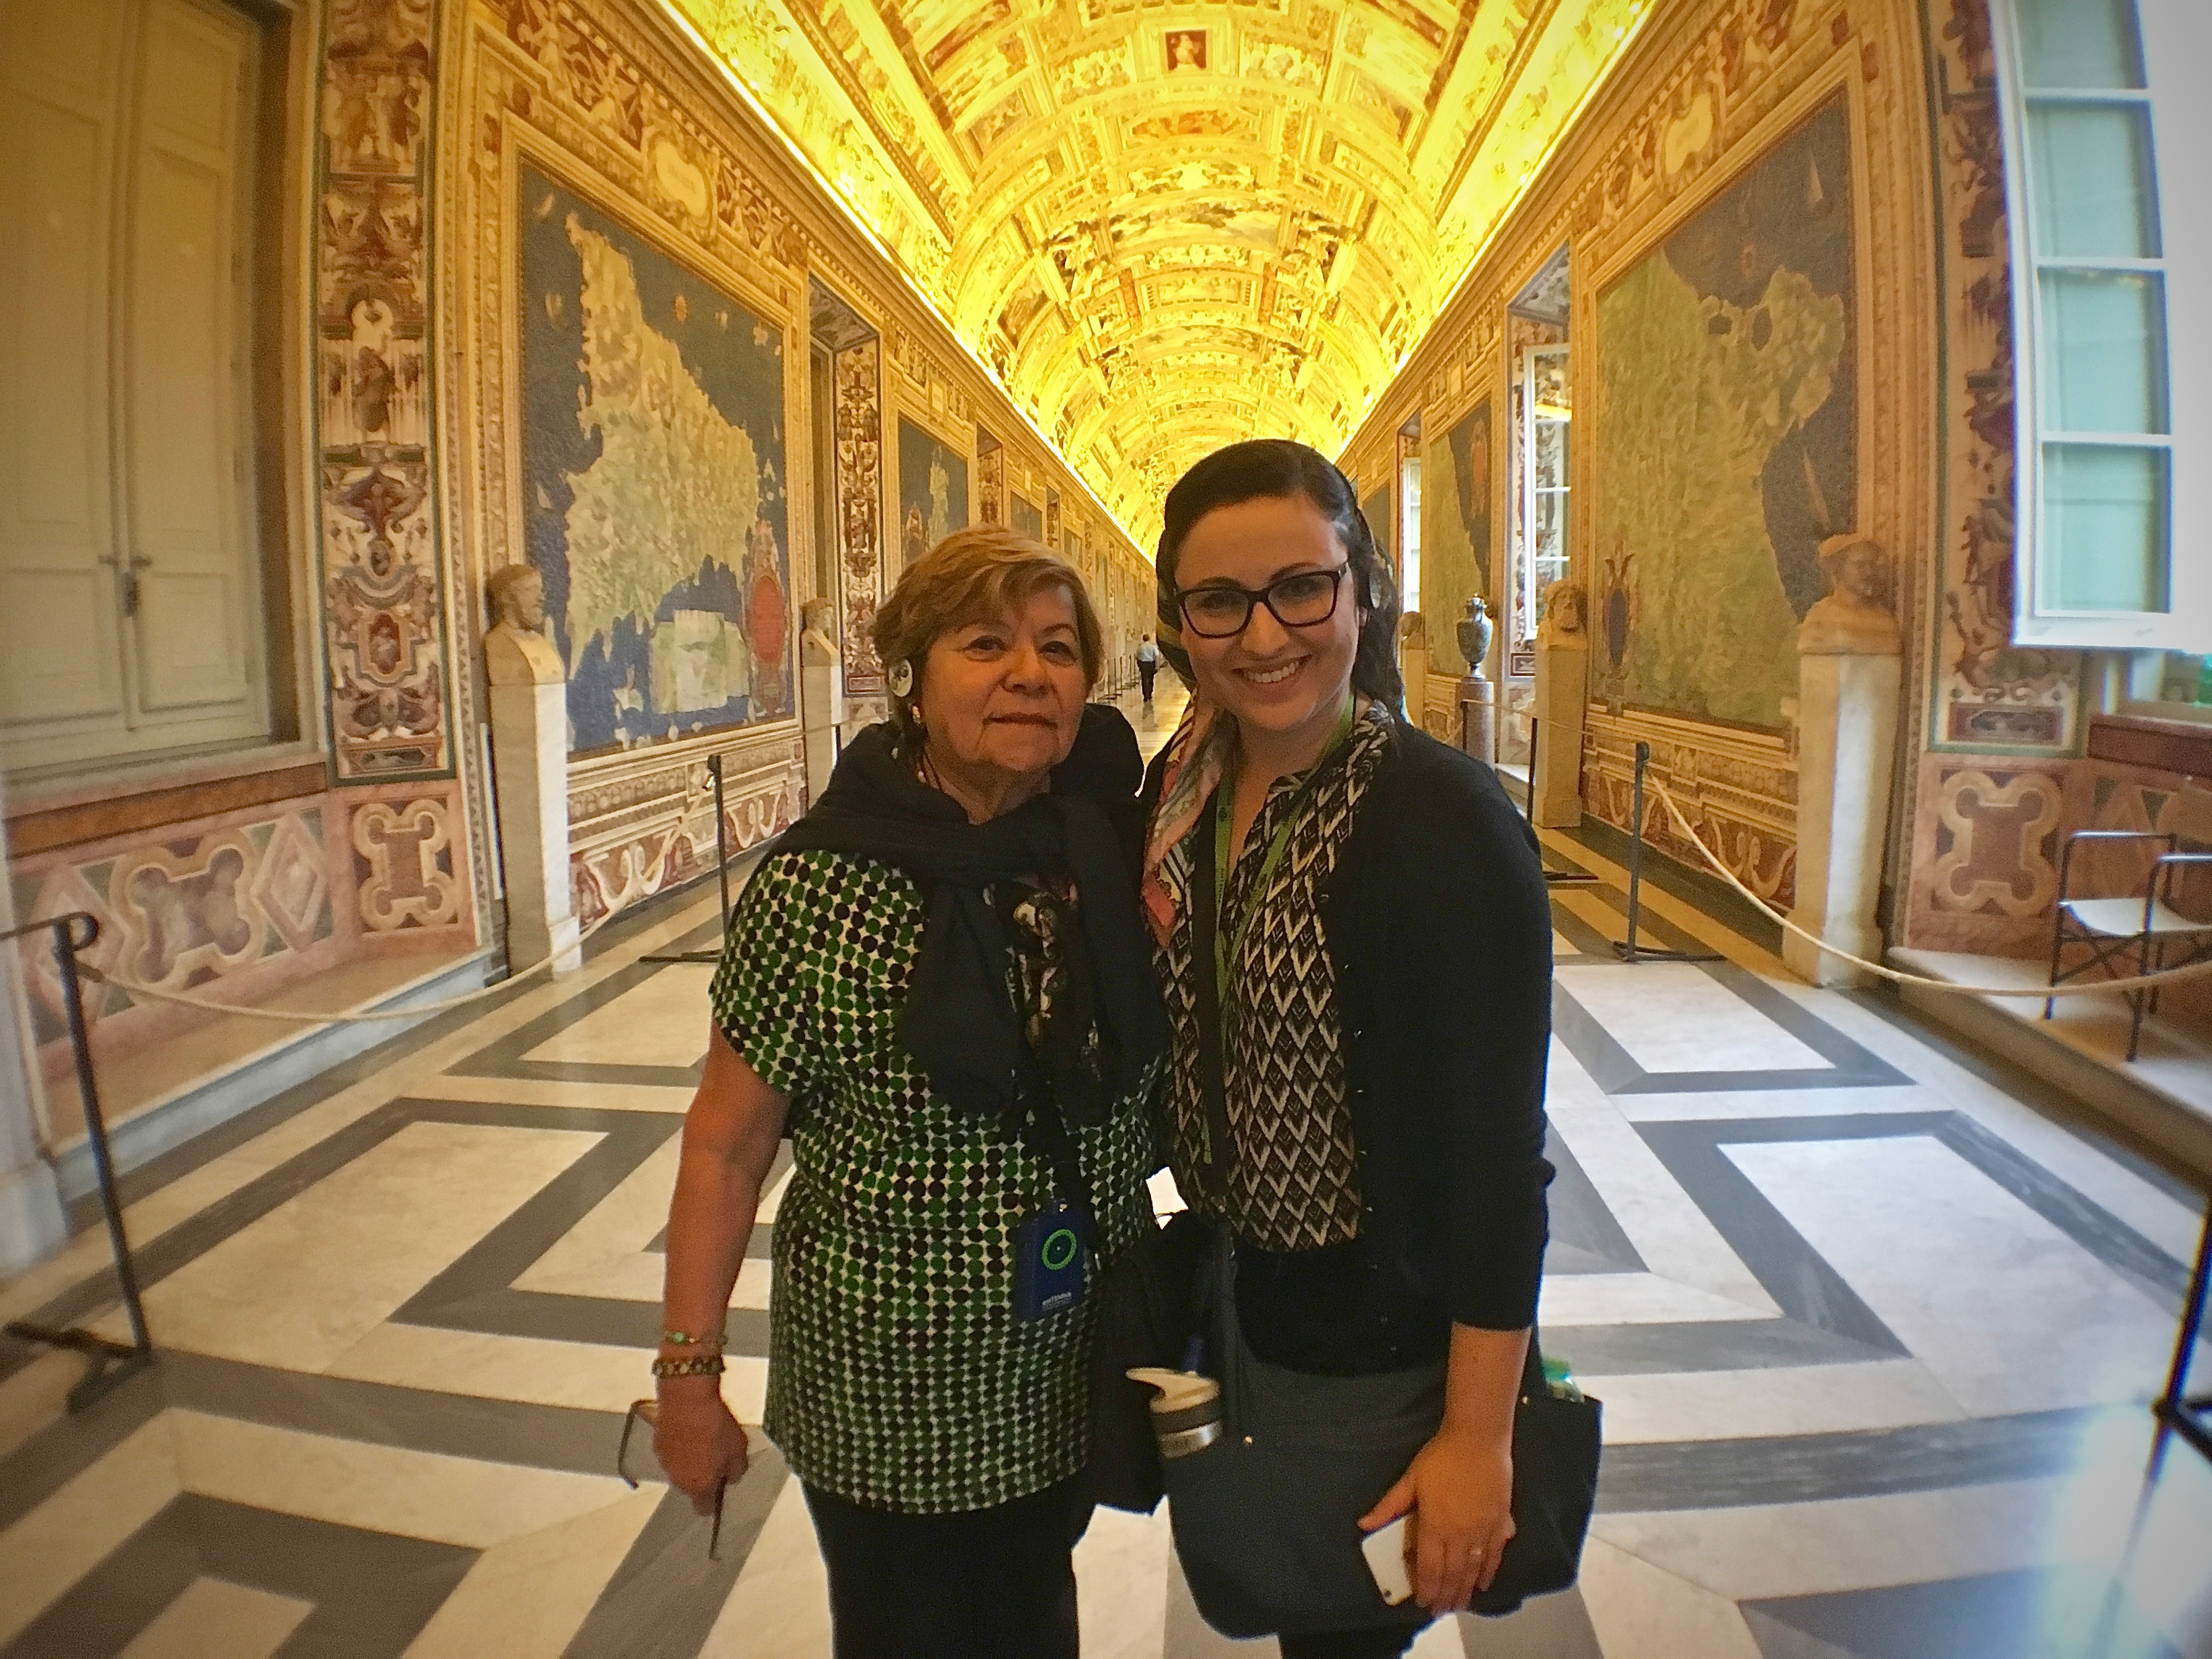 Vatican Tour Shot